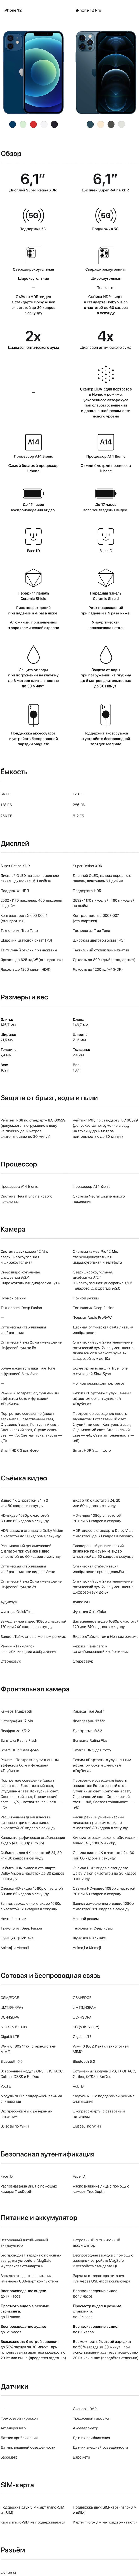 Подробное сравнение технических характеристик (спецификаций)iPhone 12 и iPhone 12 Pro